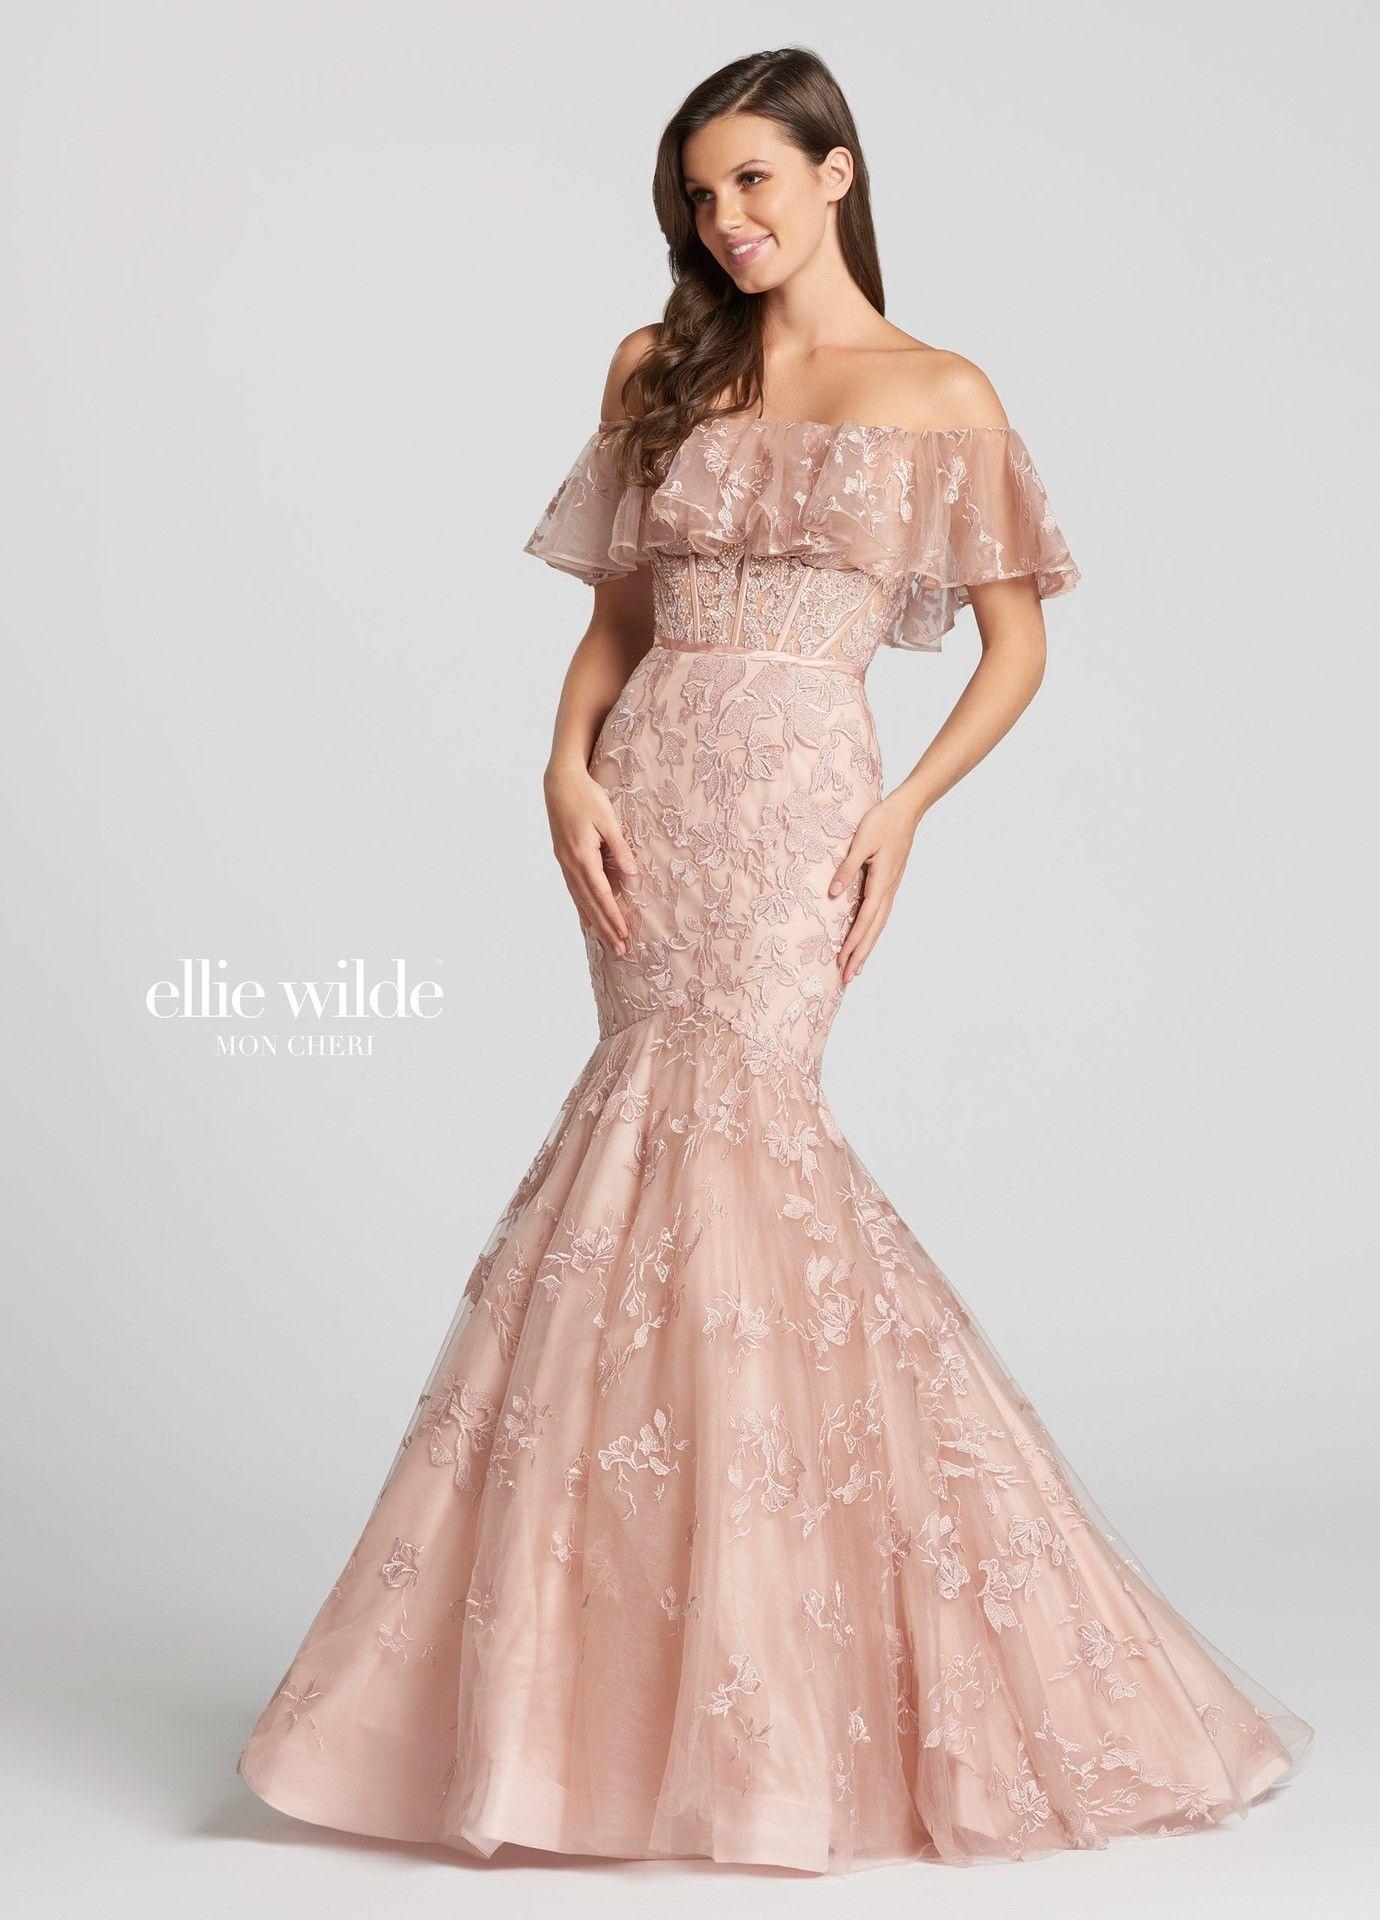 Ellie wilde ew romantic ruffle mermaid gown lace ruffle